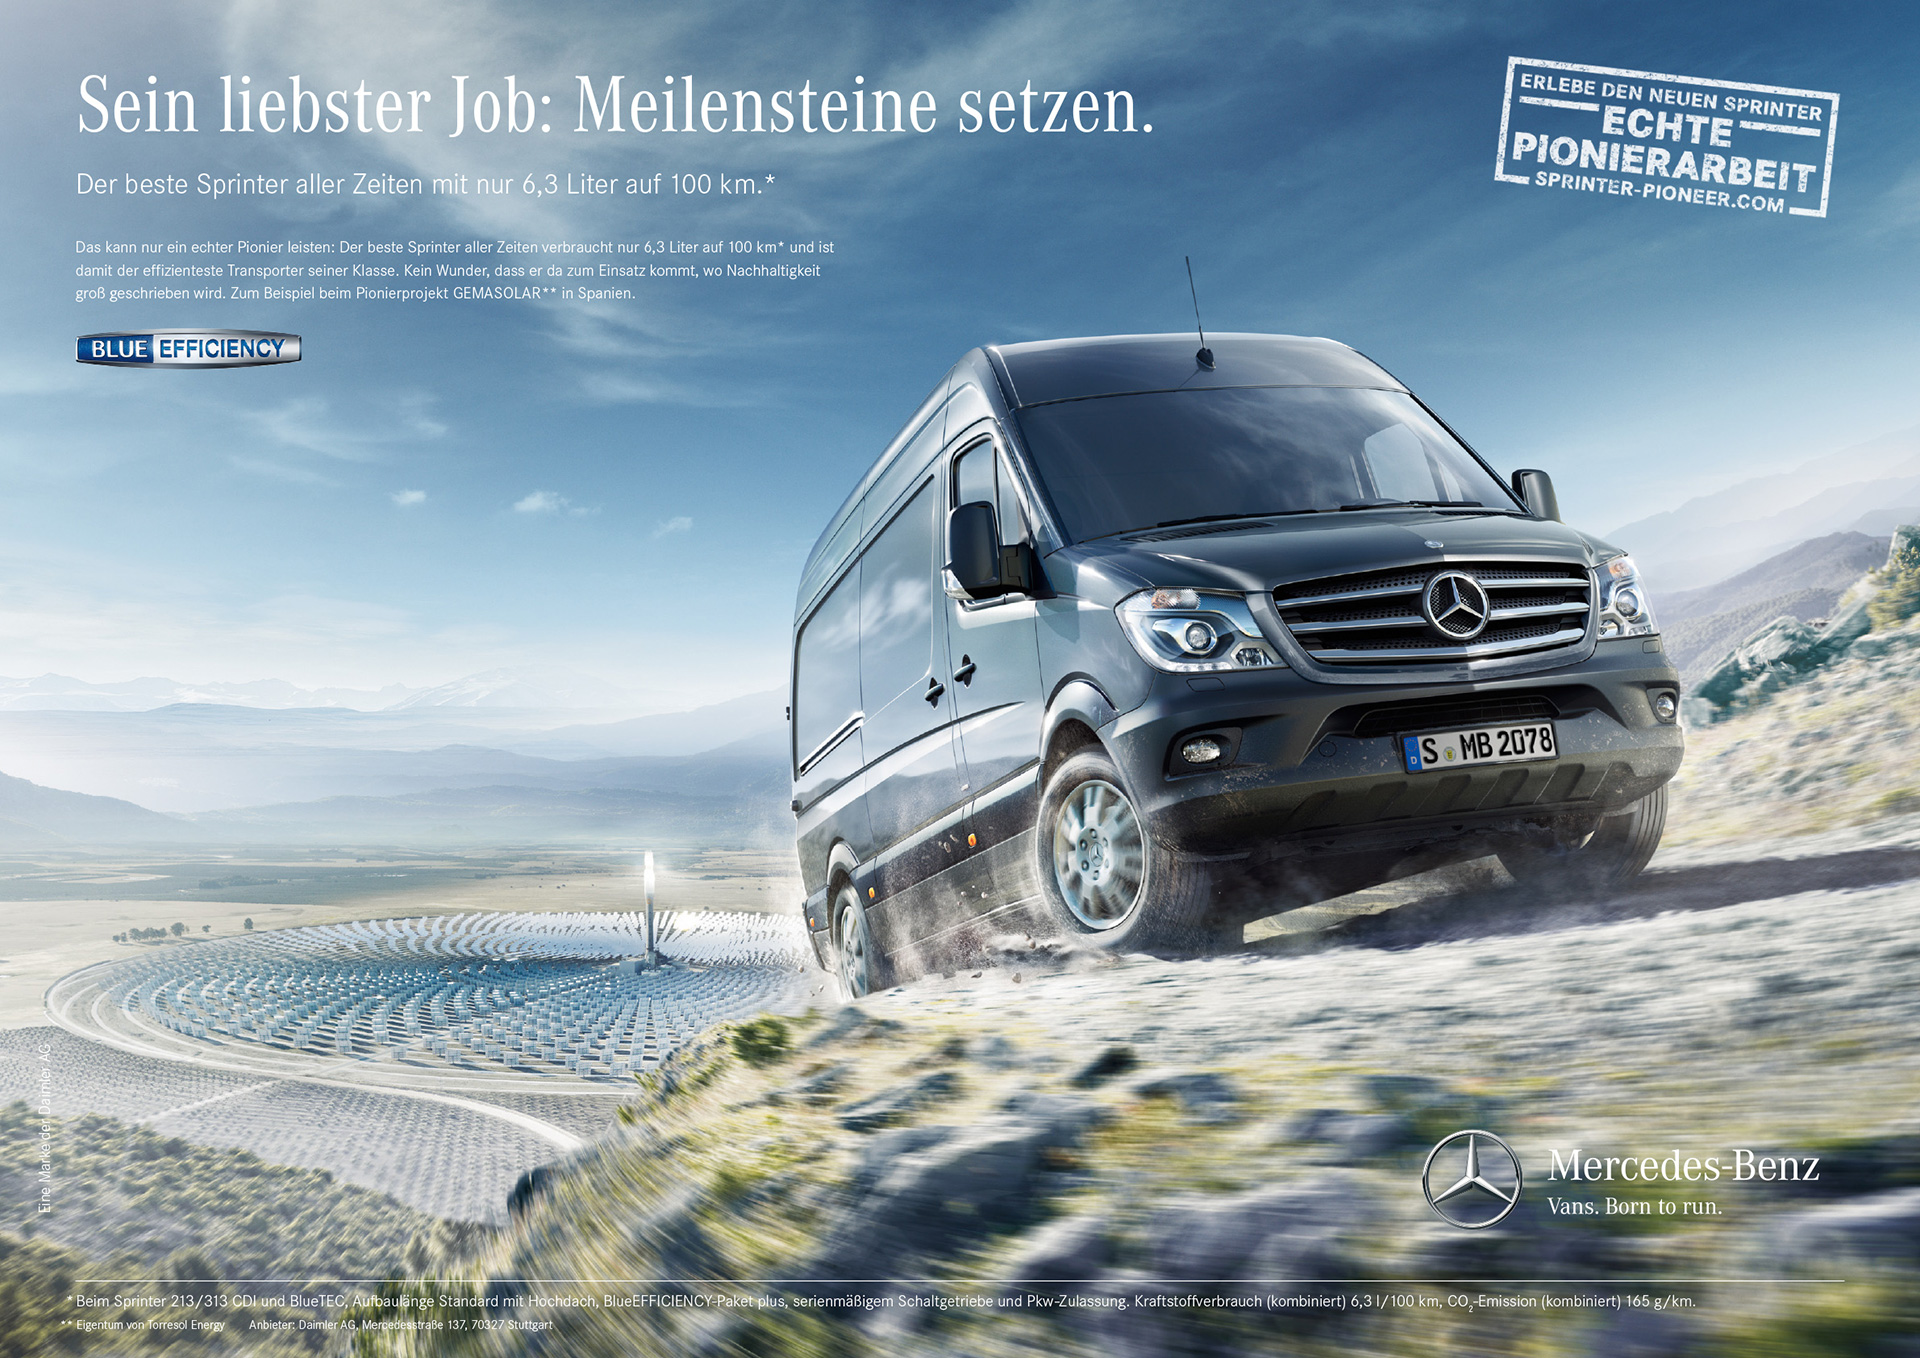 Kerstin_Correll_Mercedes-Benz_Sprinter_Pioneer_01